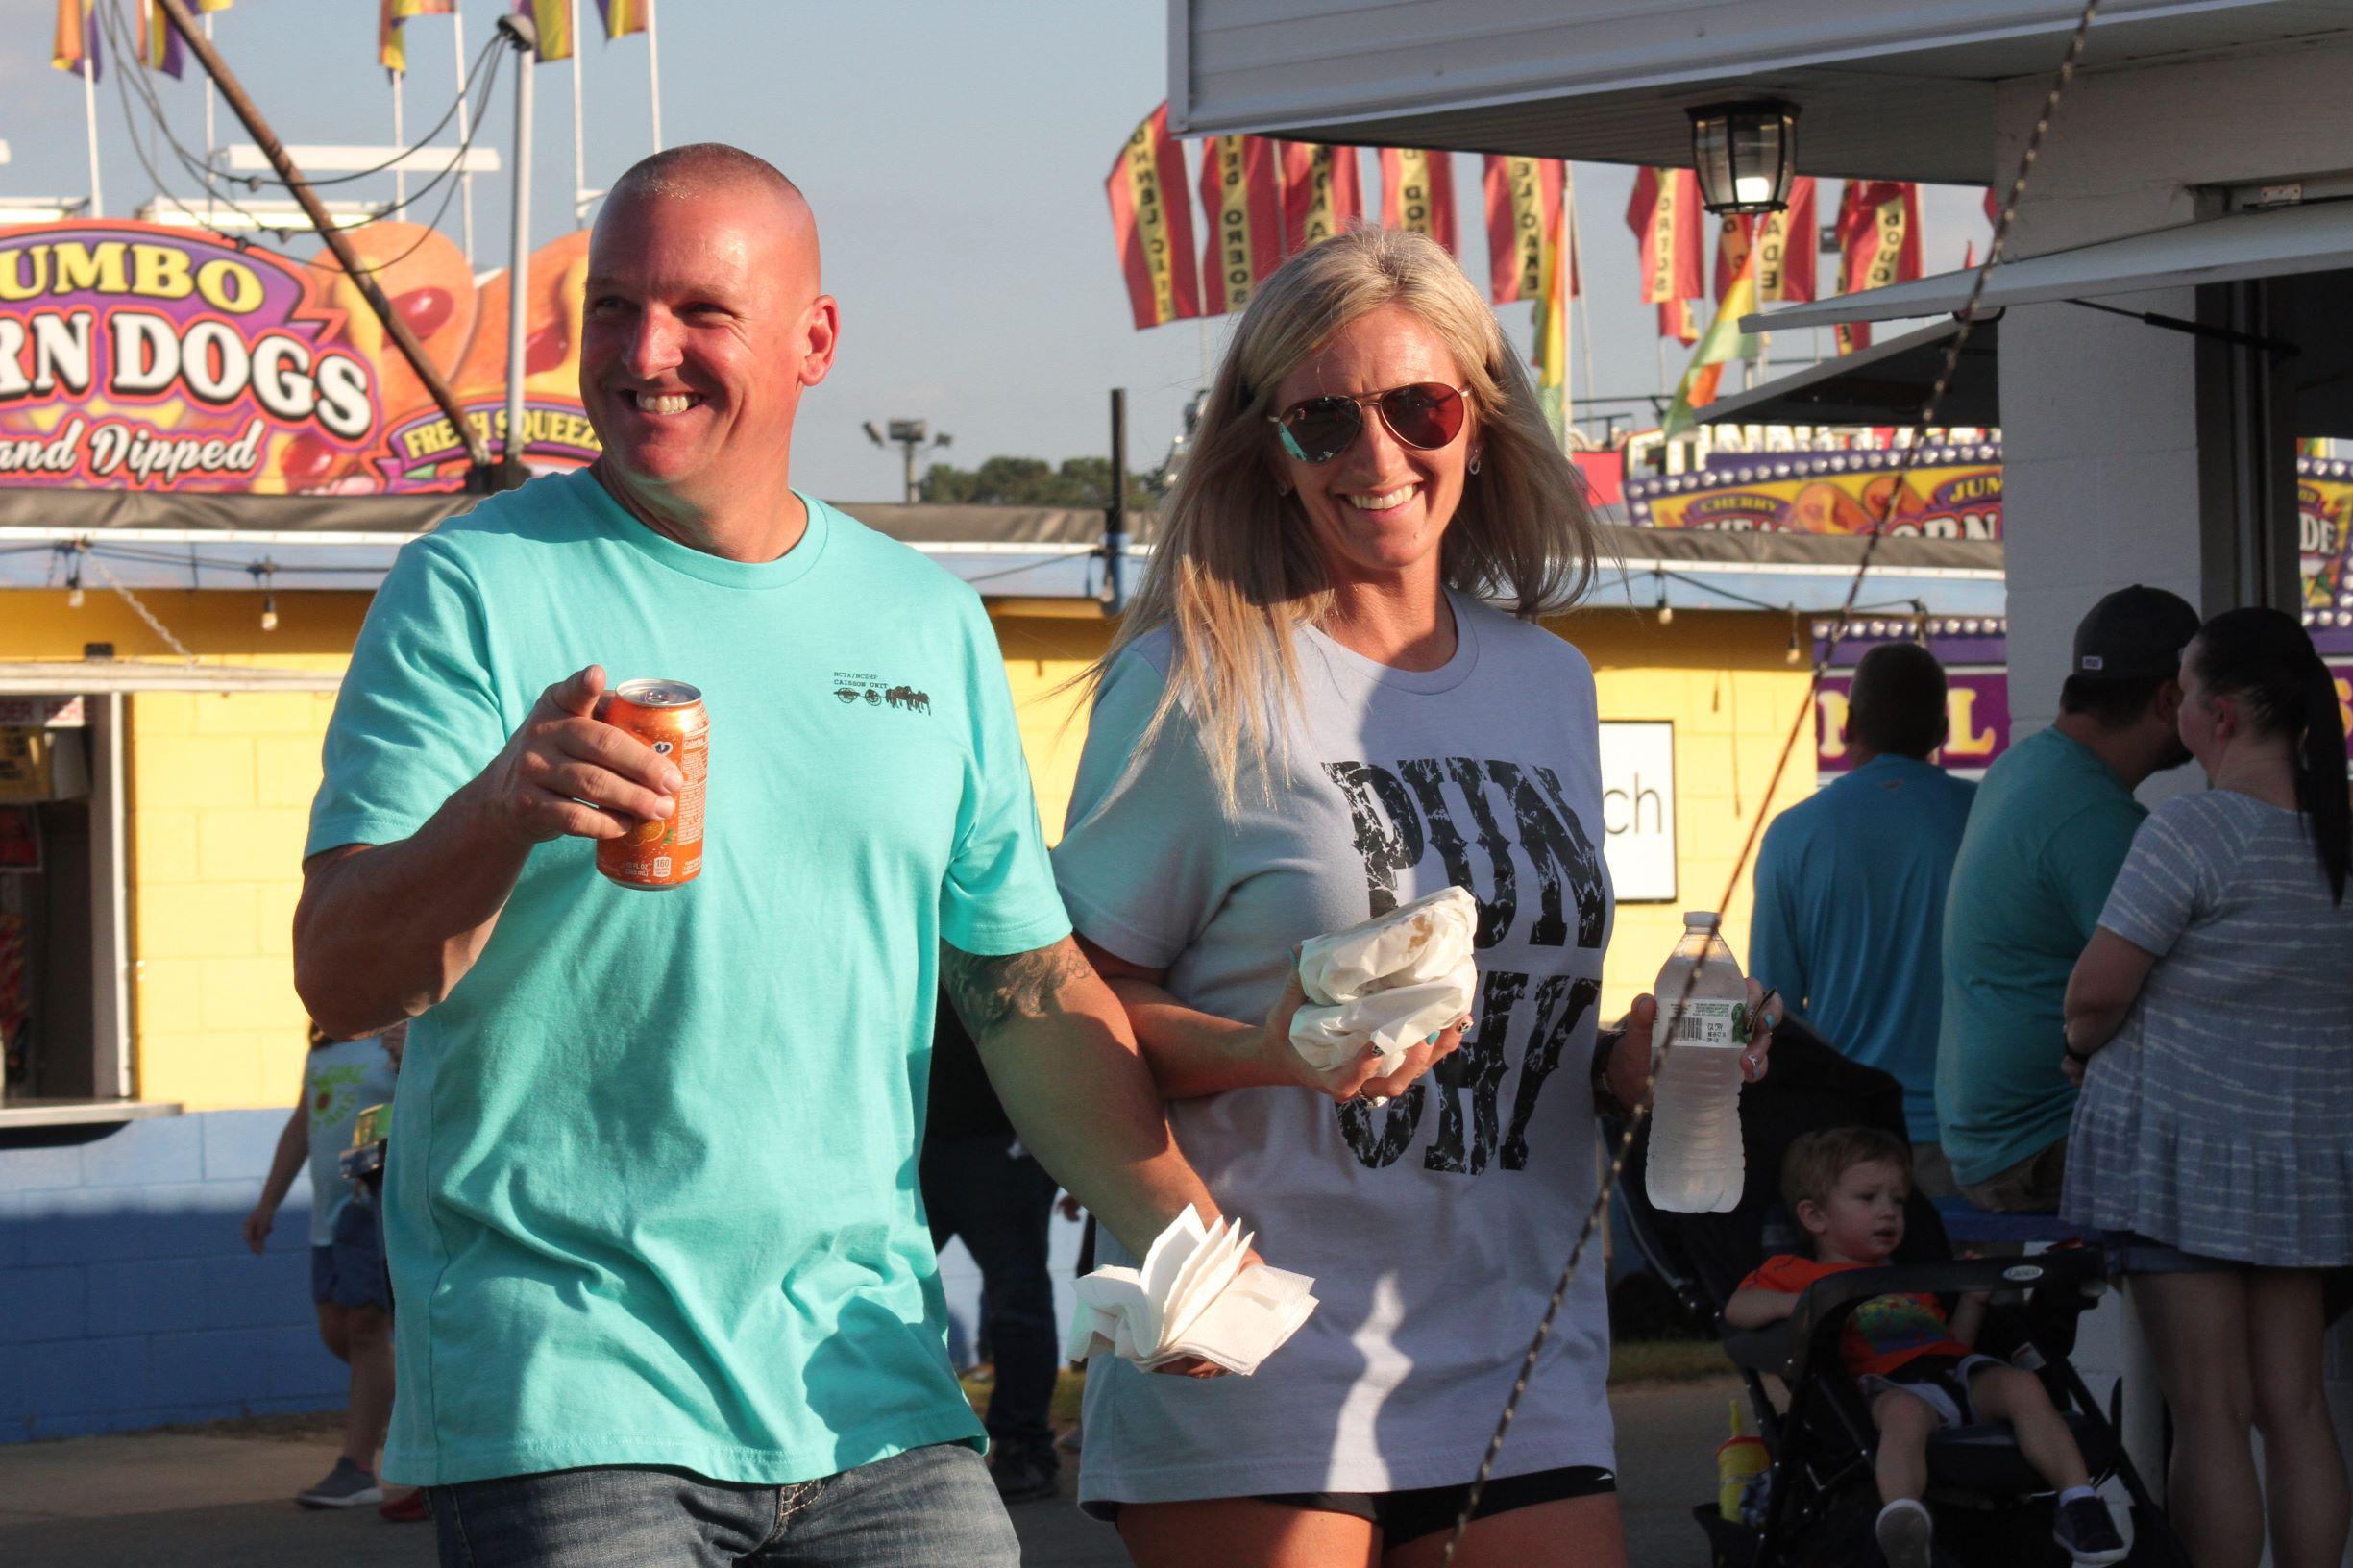 Wayne County Fair: Day 4 Schedule (PHOTO GALLERY)